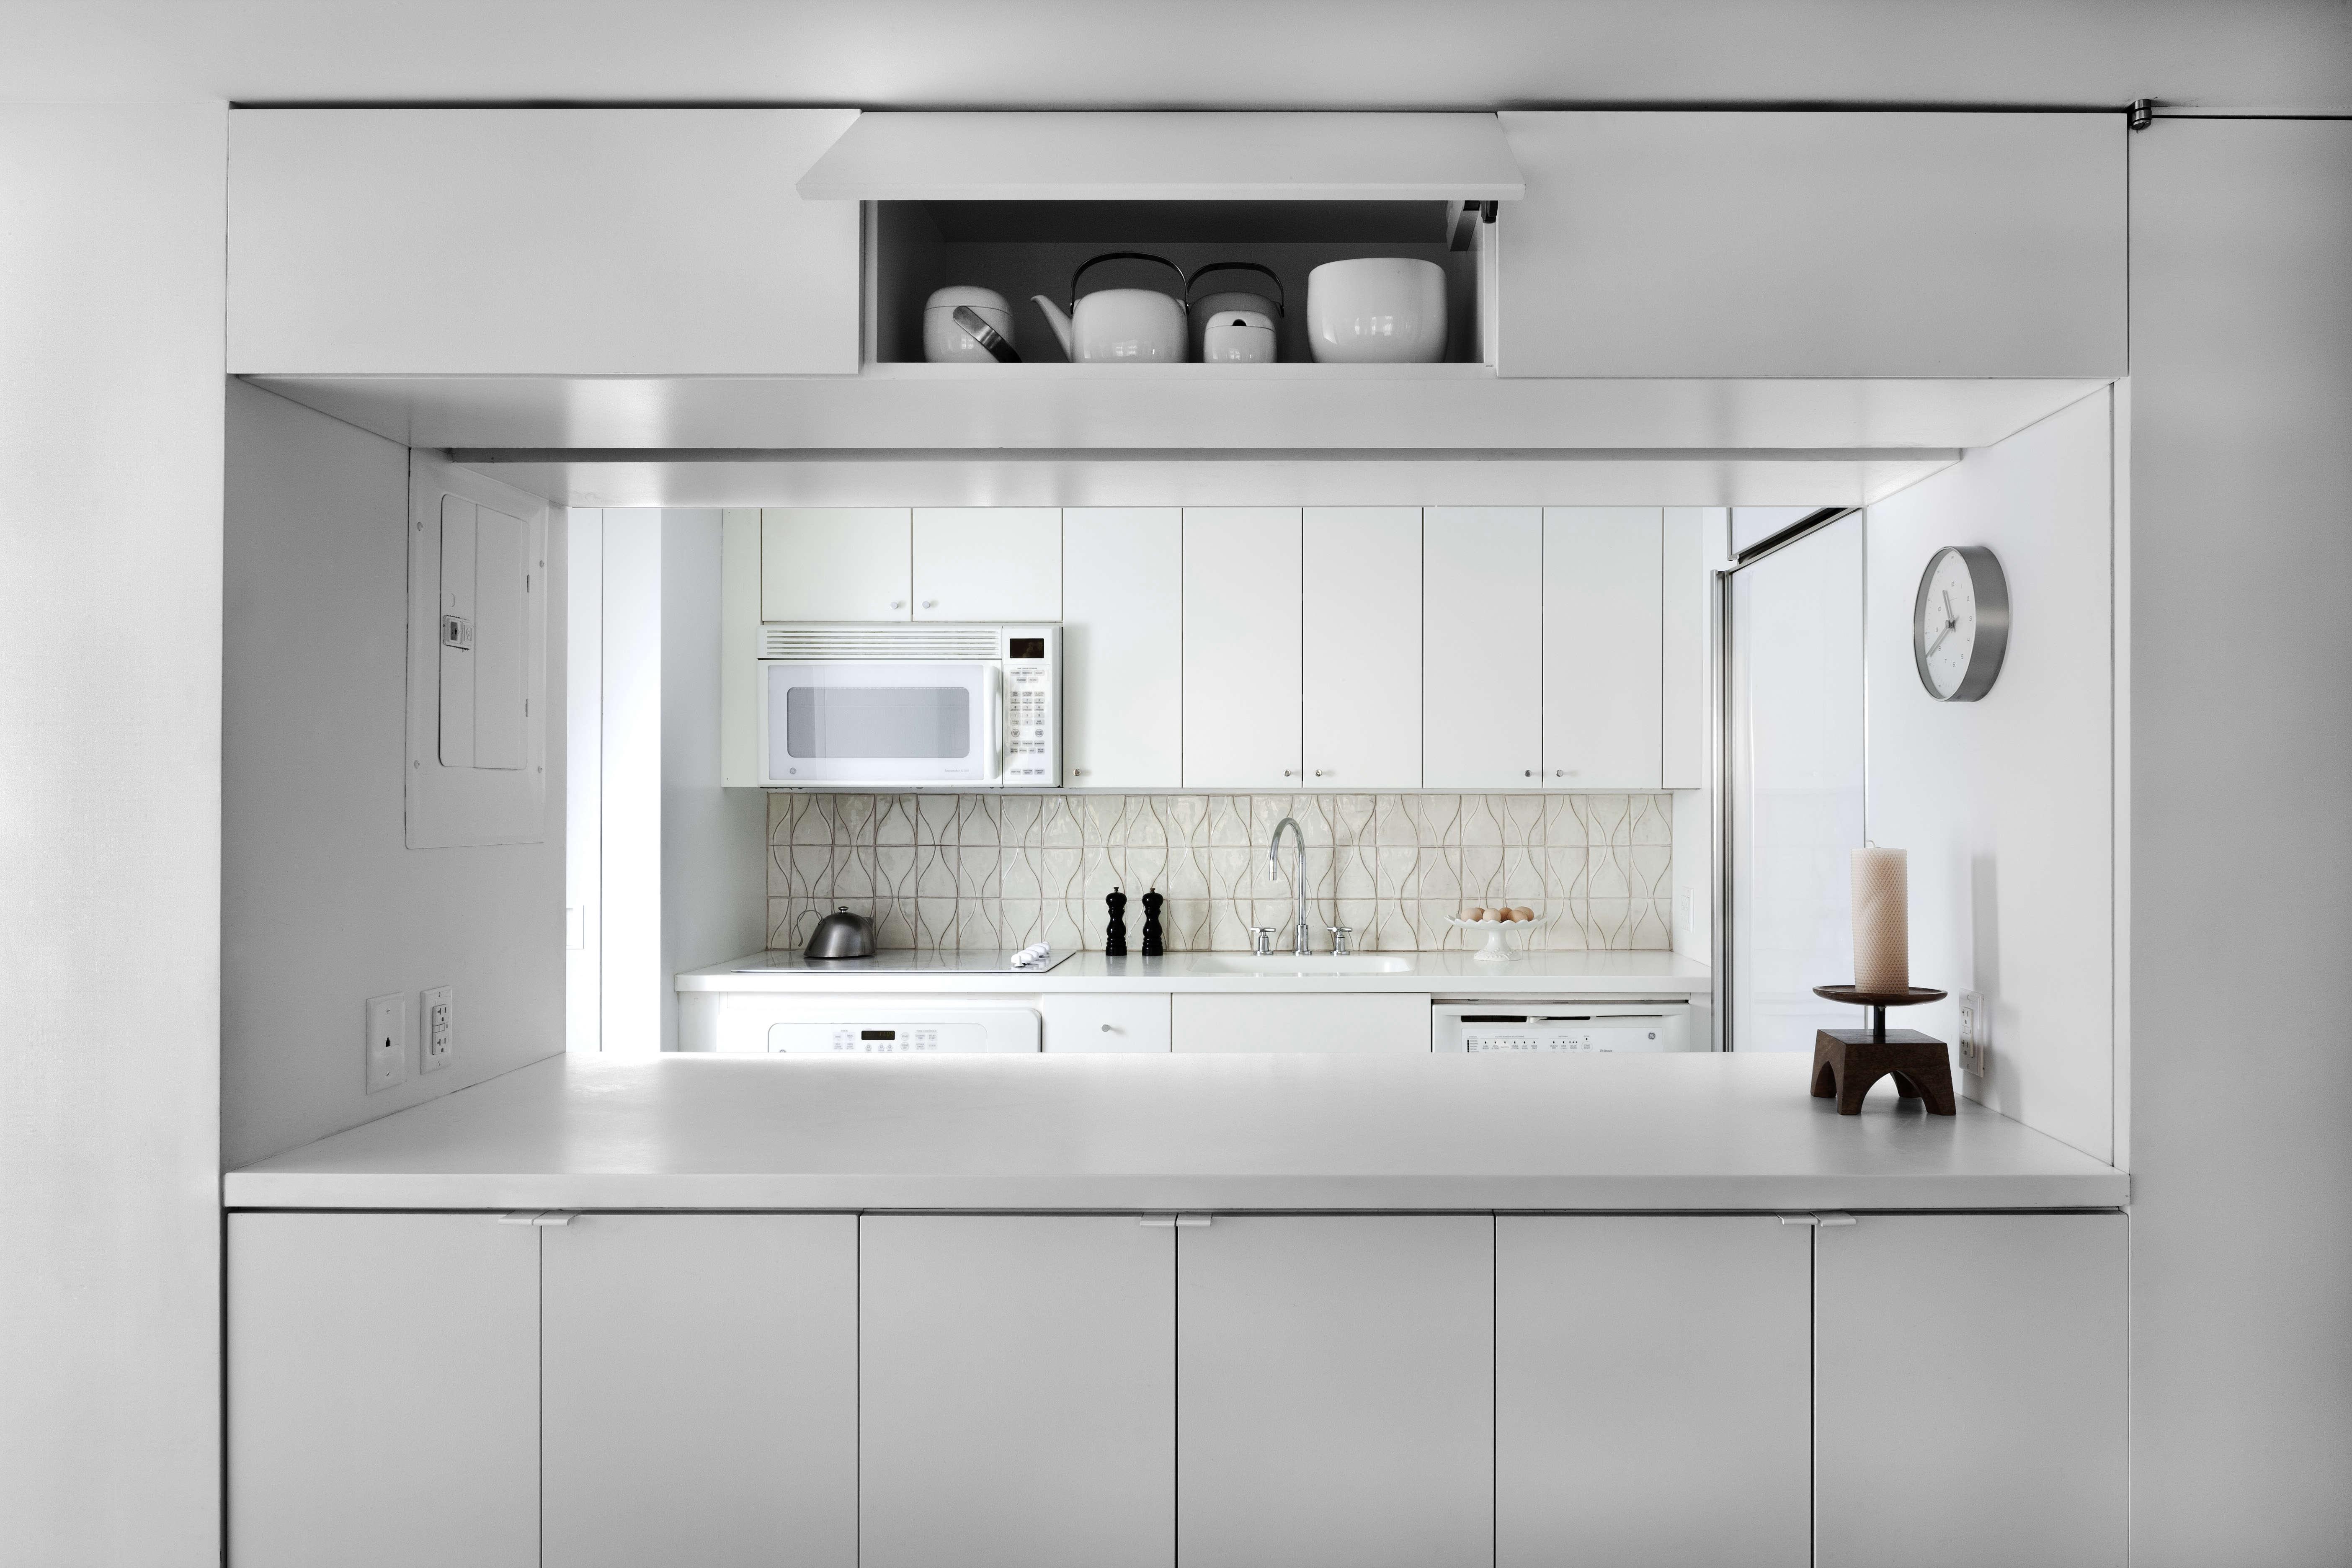 Jennifer Hanlin Cobble Hill Apartment Kitchen, Photo By Bruce Buck